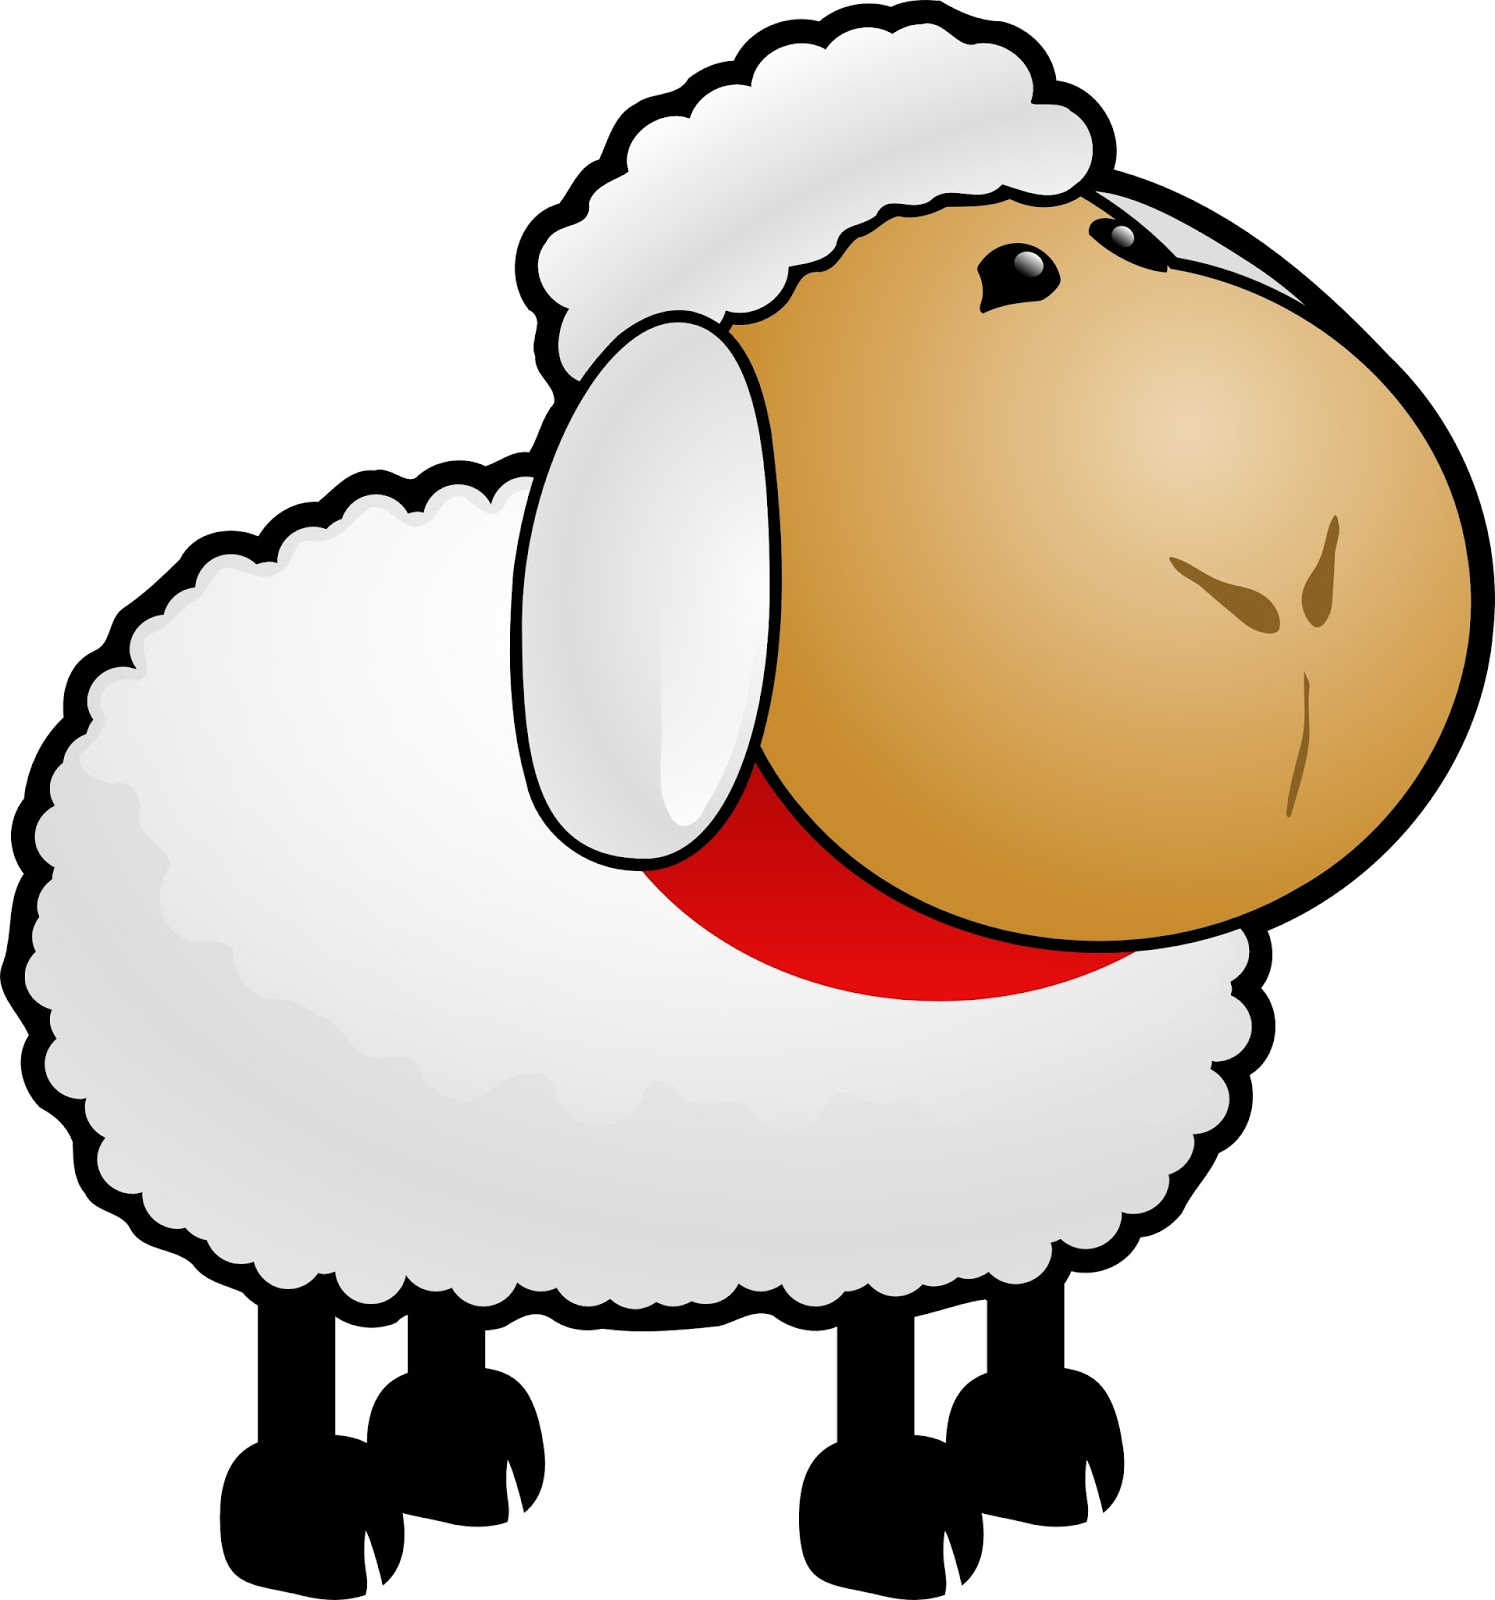 Gambar Domba Kartun Berwarna   Tentang Kolam Kandang Ternak with Gambar Domba Animasi